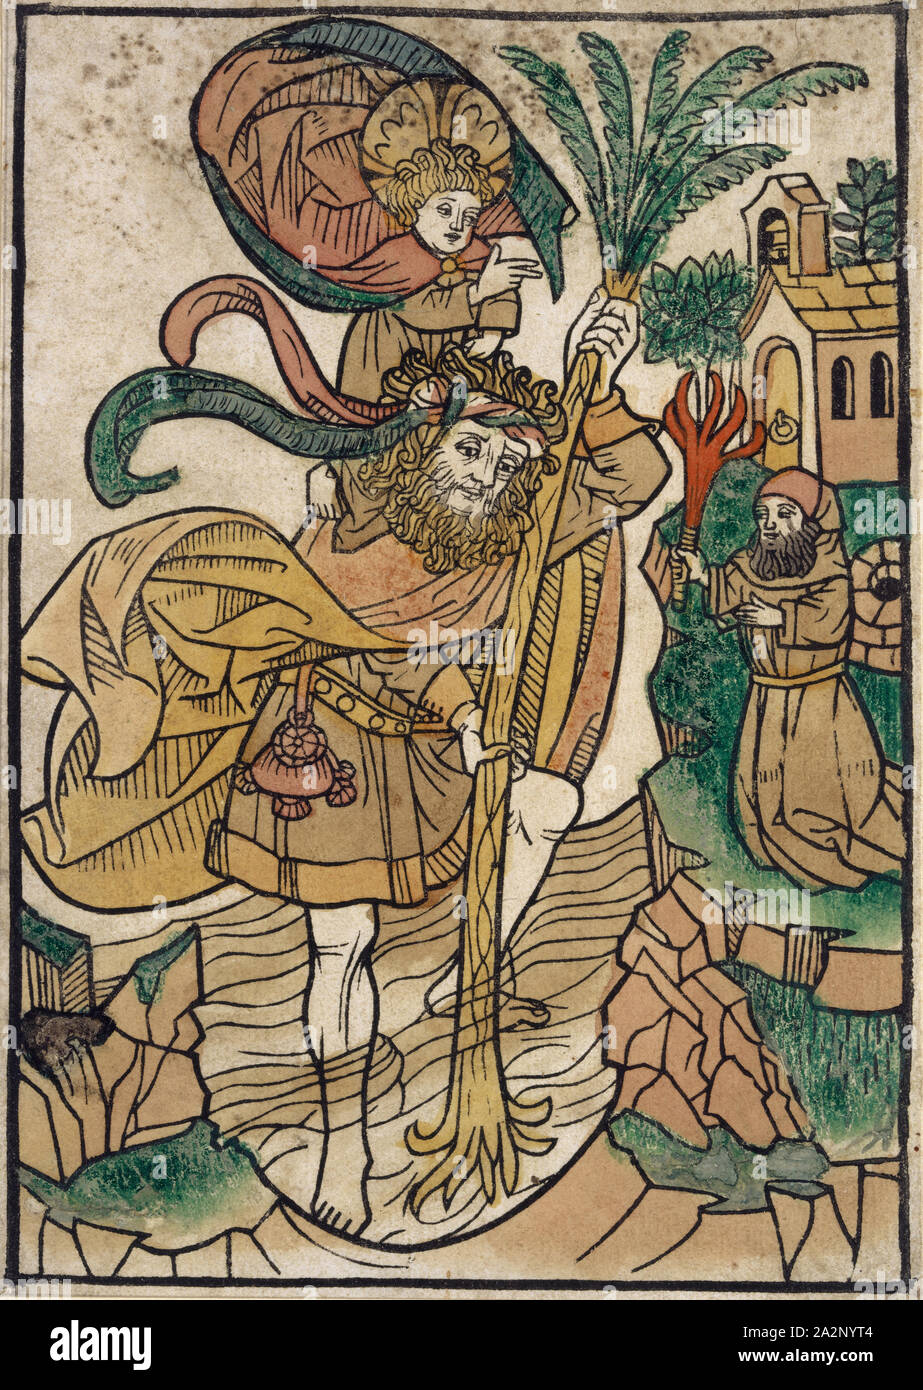 St. Christopher, c. 1480, woodcut, colored (unique), unique, folia: 19 x 13.6 cm, Anonym, Oberrhein, 15. Jh Stock Photo